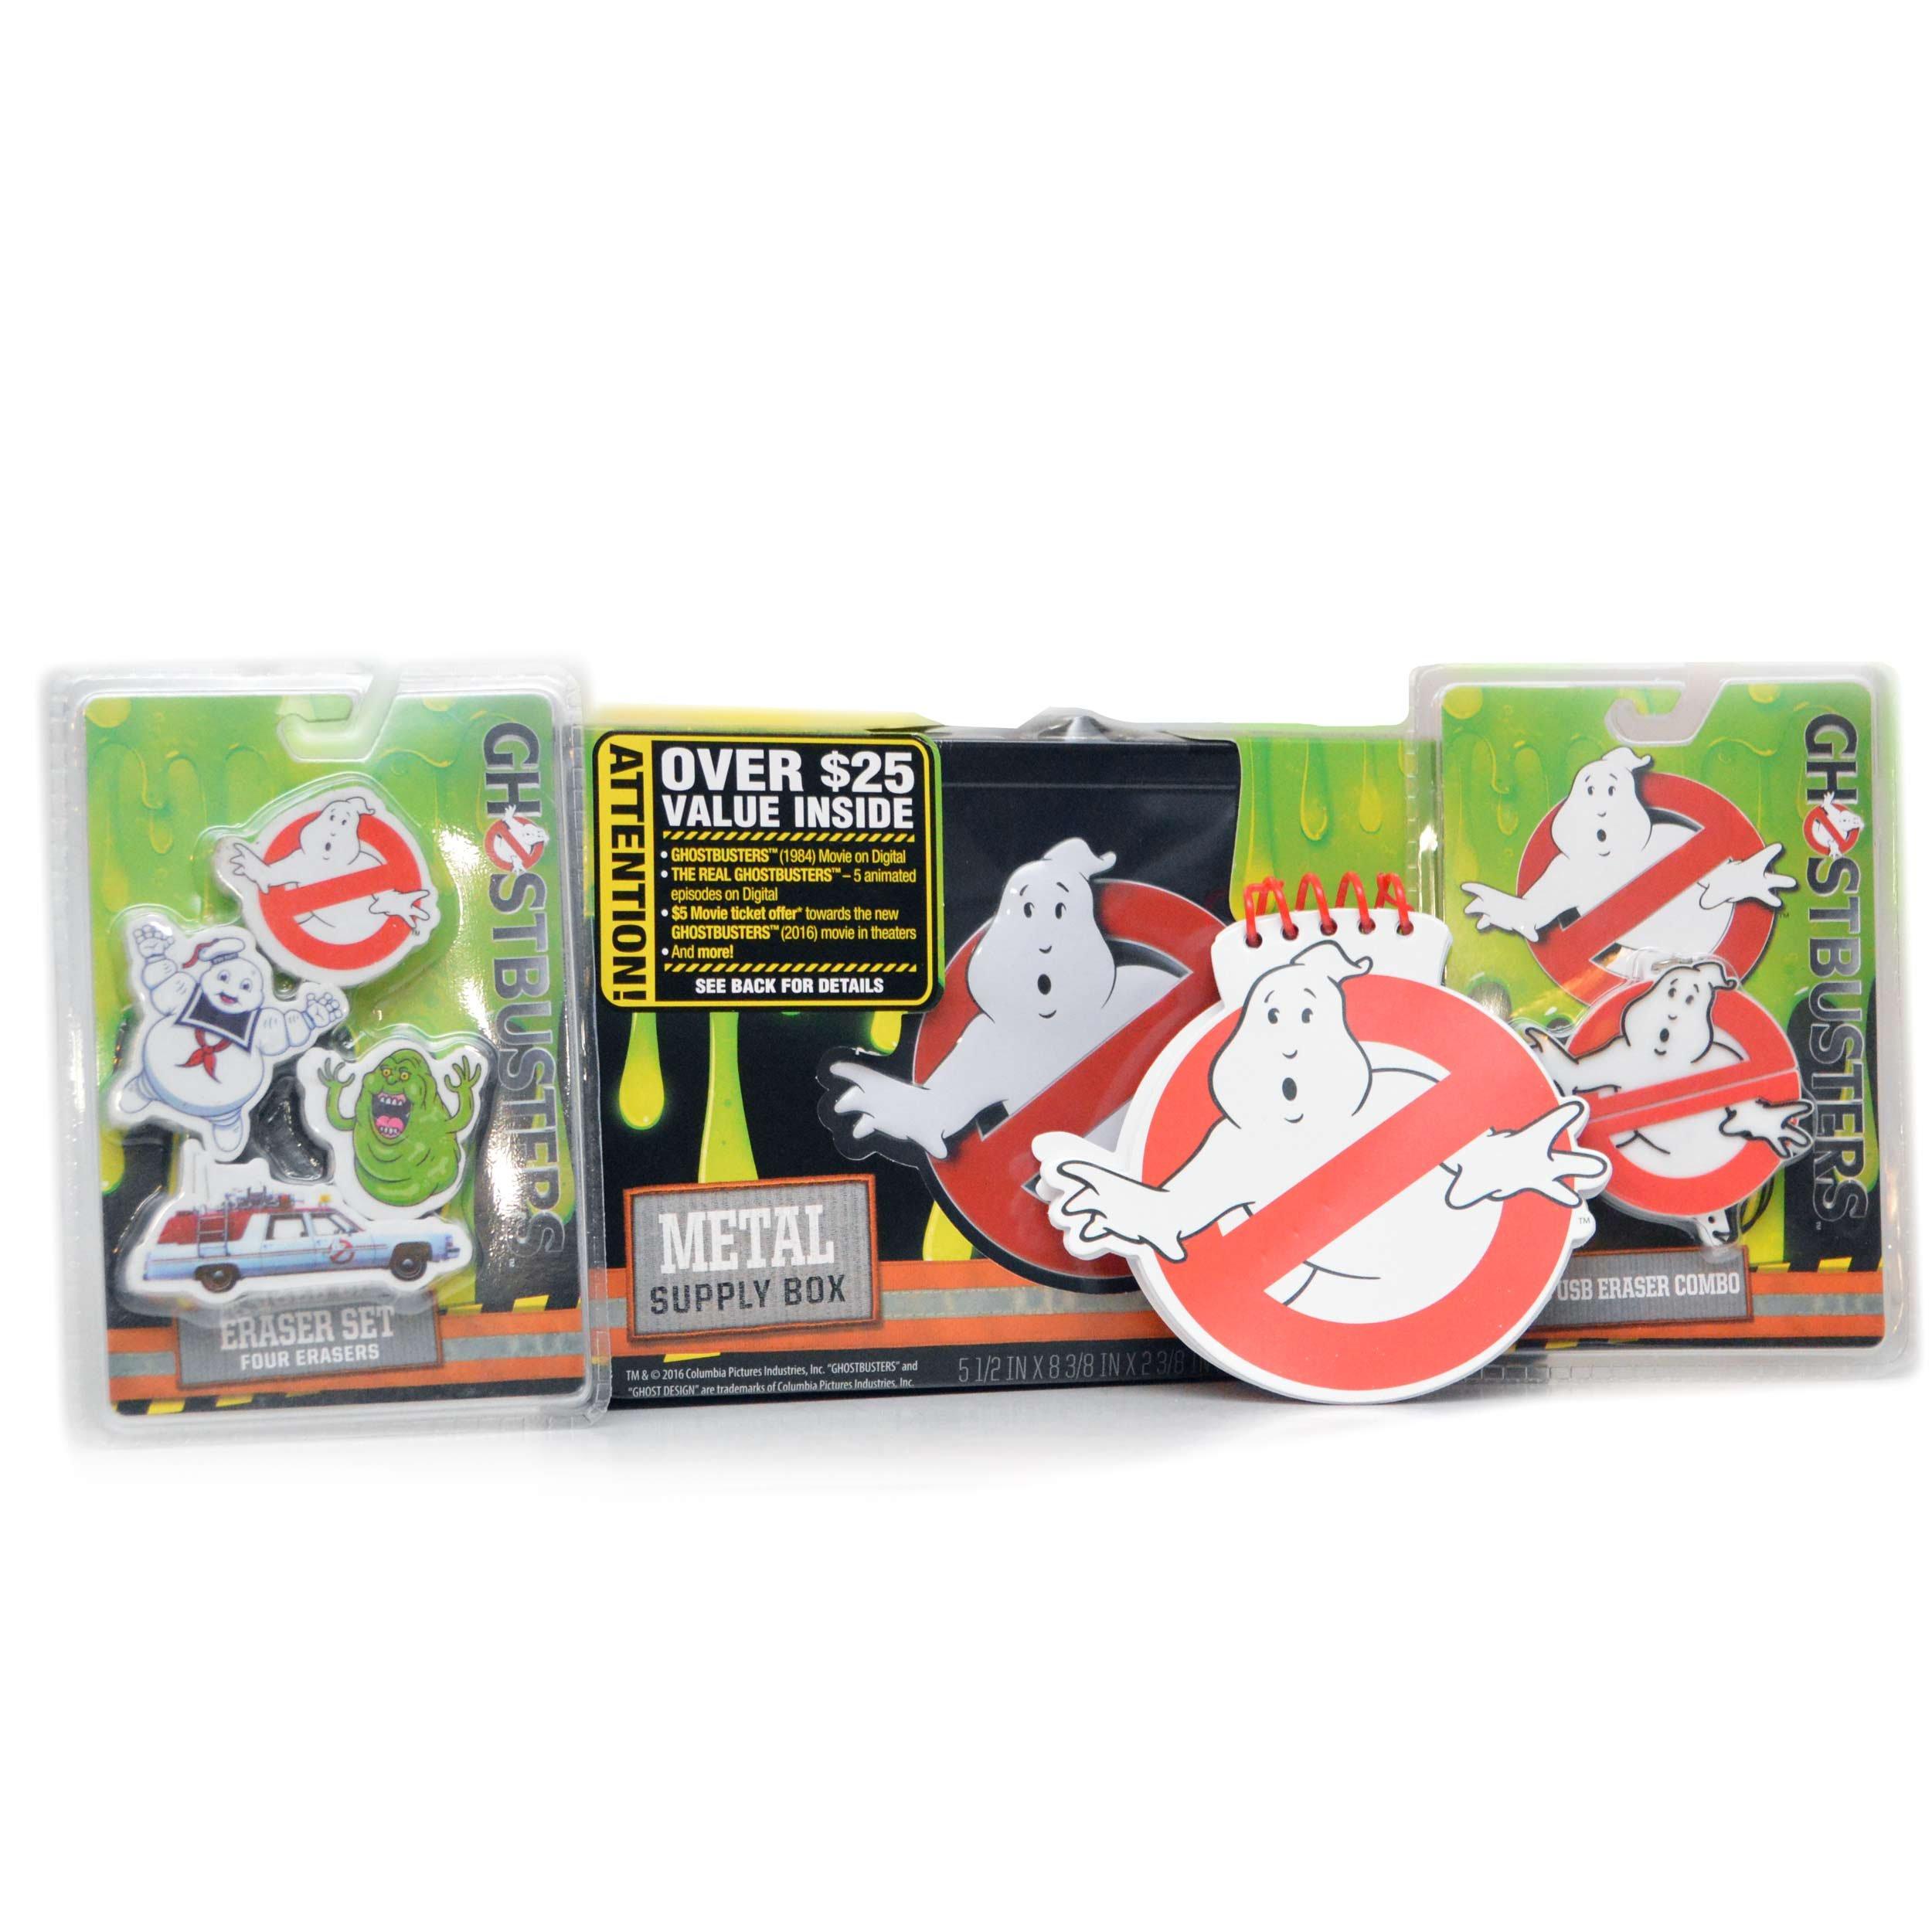 Ghostbusters School SPIRIT Bundle: Metal School Supplies Storage Box, 1 GB Eraser USB Combo, 1 Spiral Notepad, 3 Erasers: Ecto-1 Stay Puft Slimer, 1984 & $5 off Pre-Order, 5 Ep of GB Cartoon